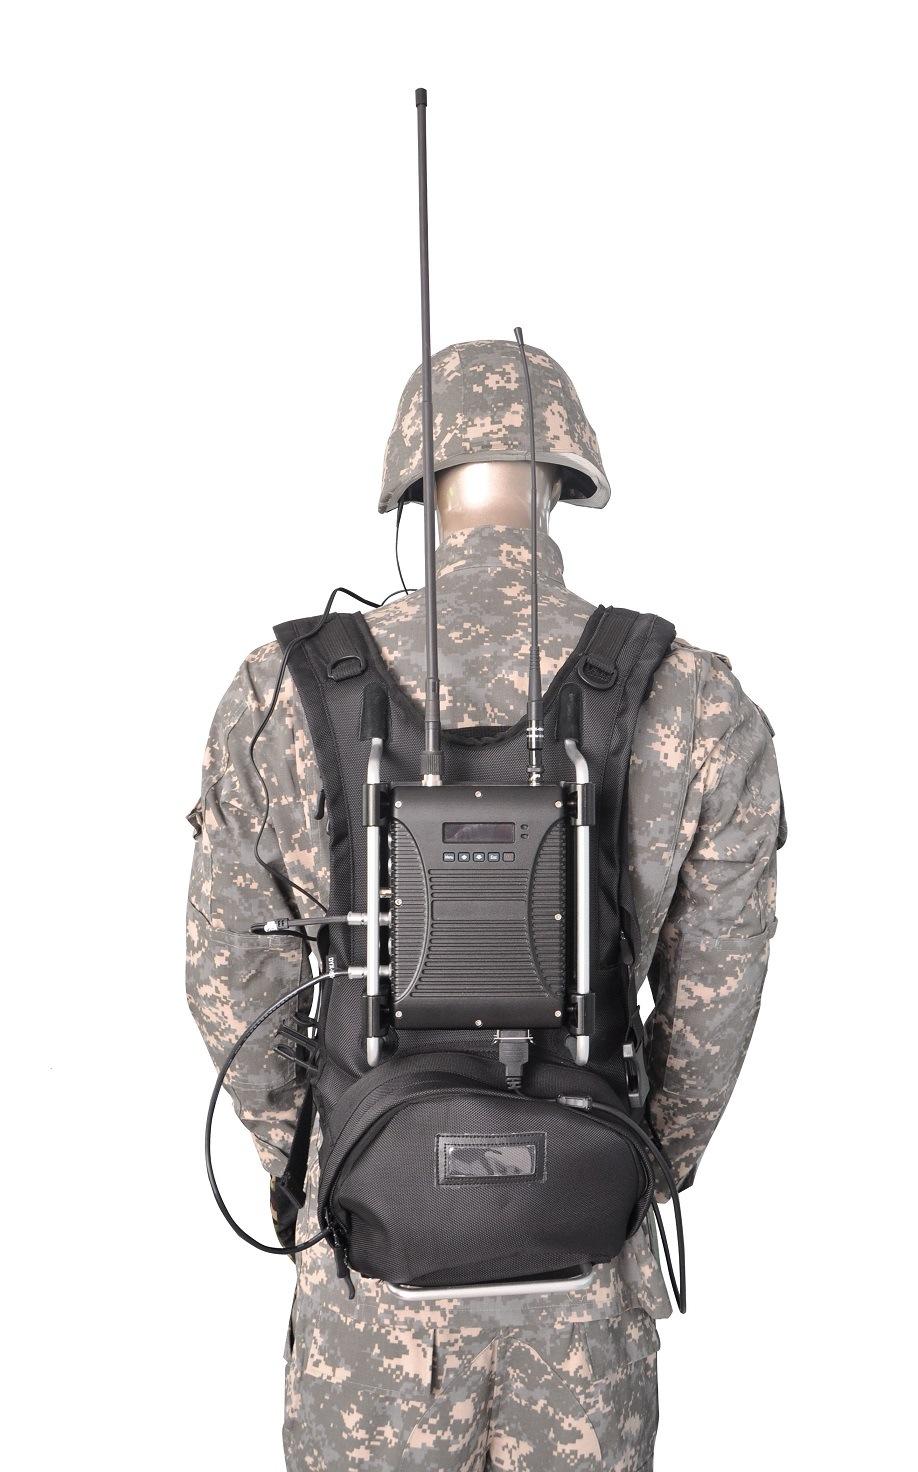 Cofdm HD Manpack Video Transmitter/Sender/Encoder